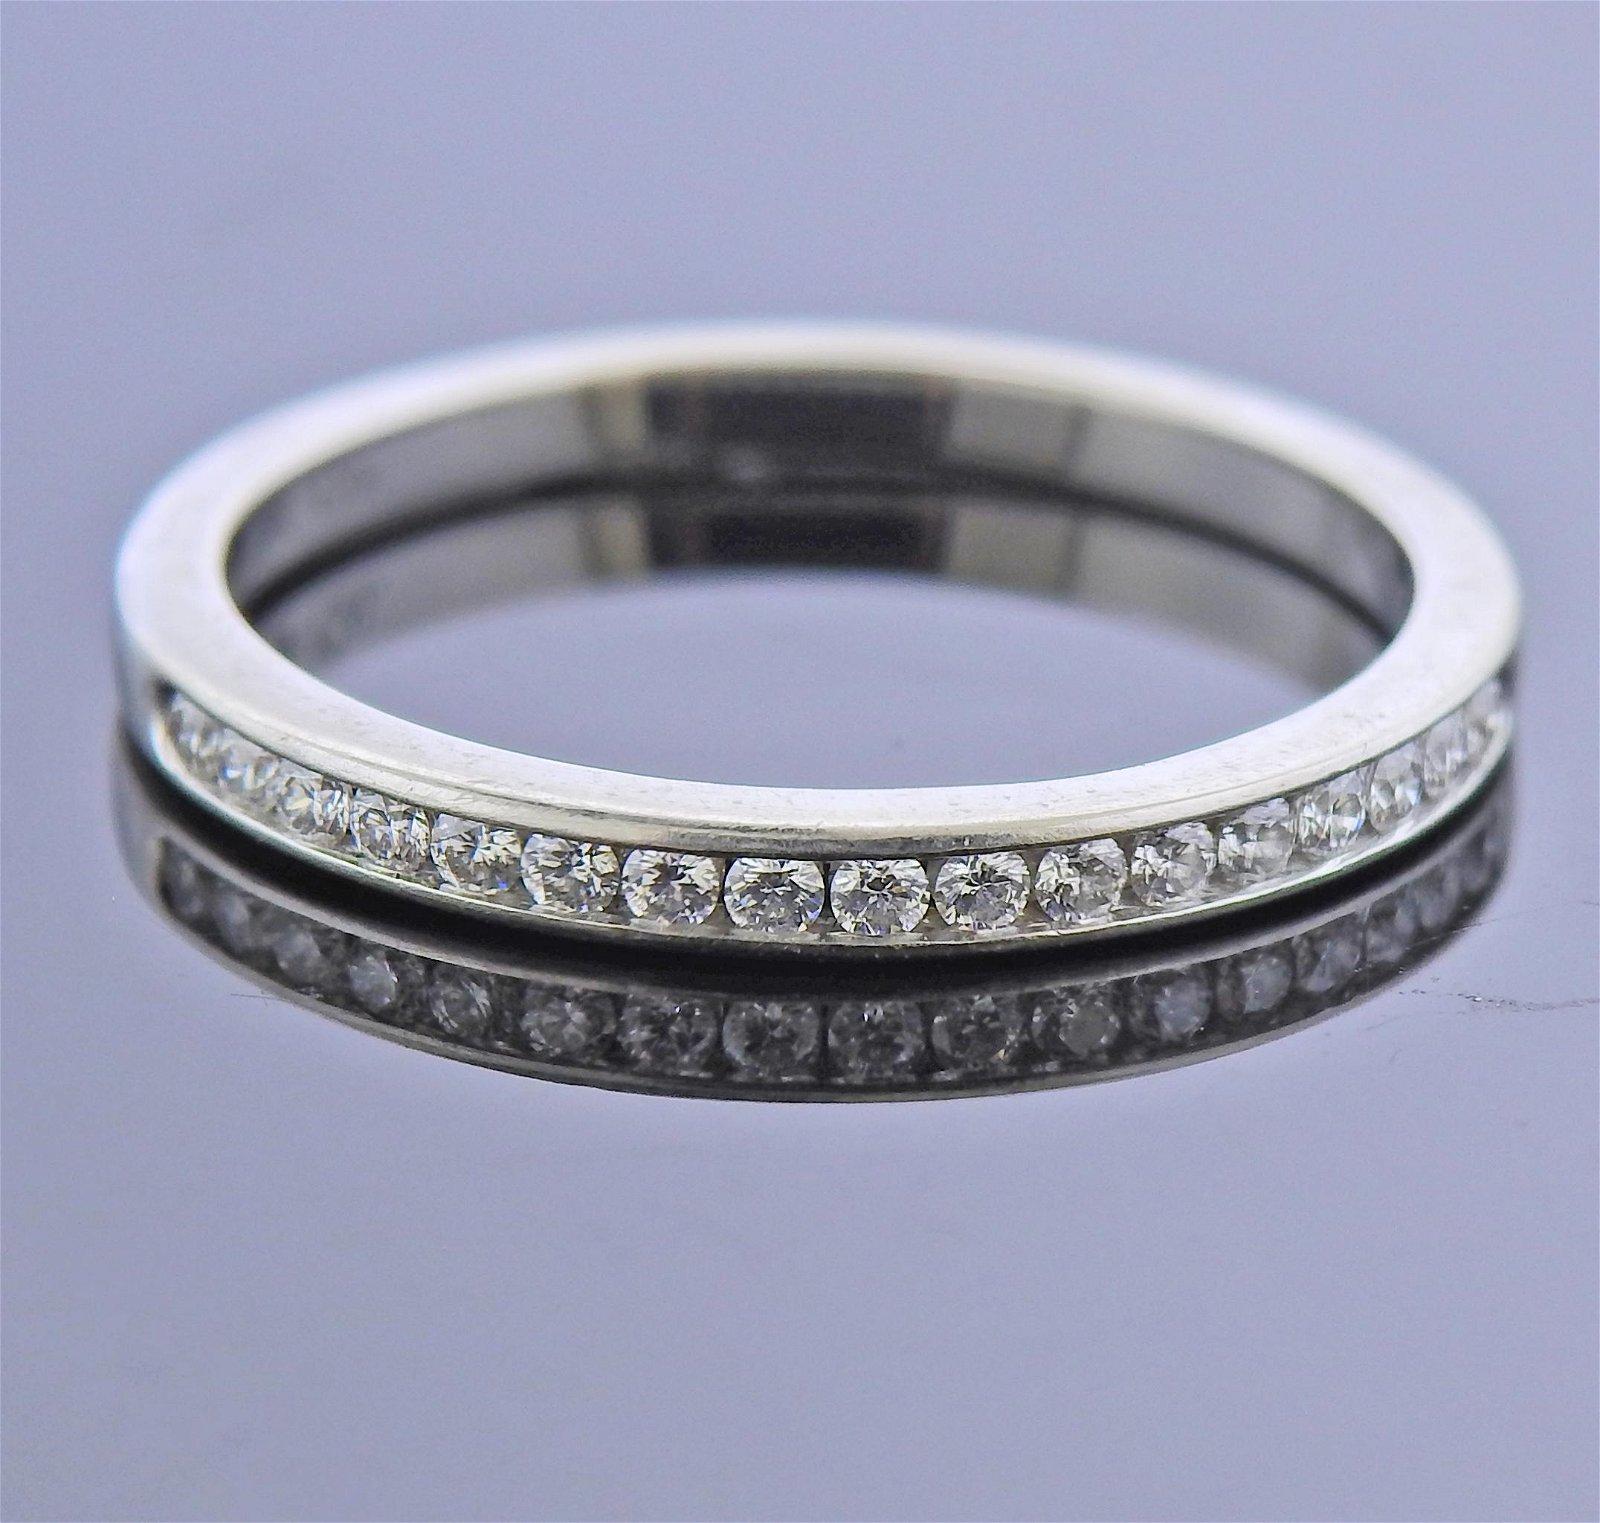 Tiffany & Co Platinum Diamond Wedding Band Ring